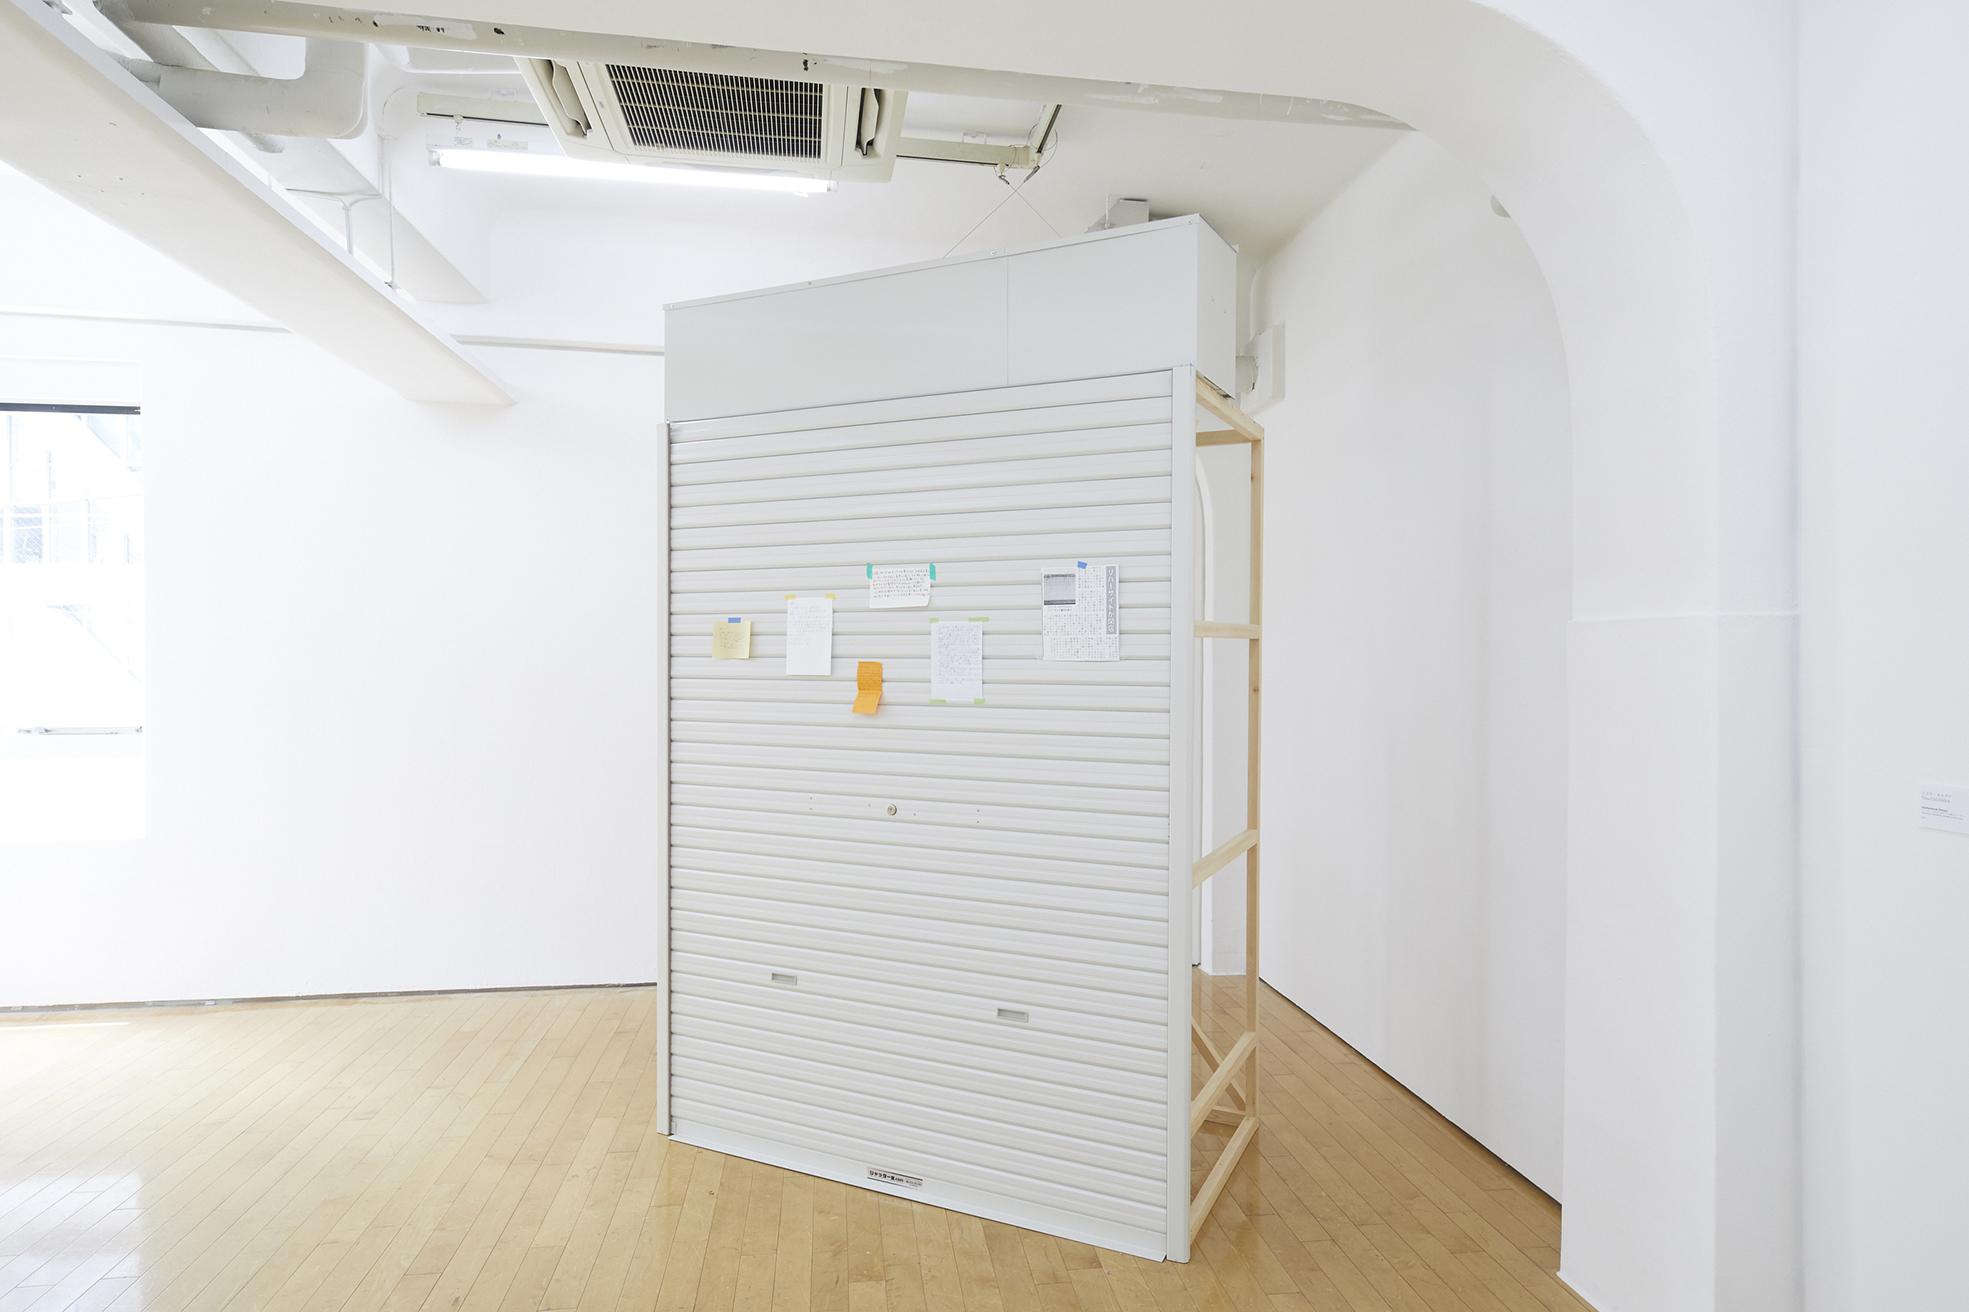 Elisa Caldana, Shutterstreet (Tokyo), 2019, installation view